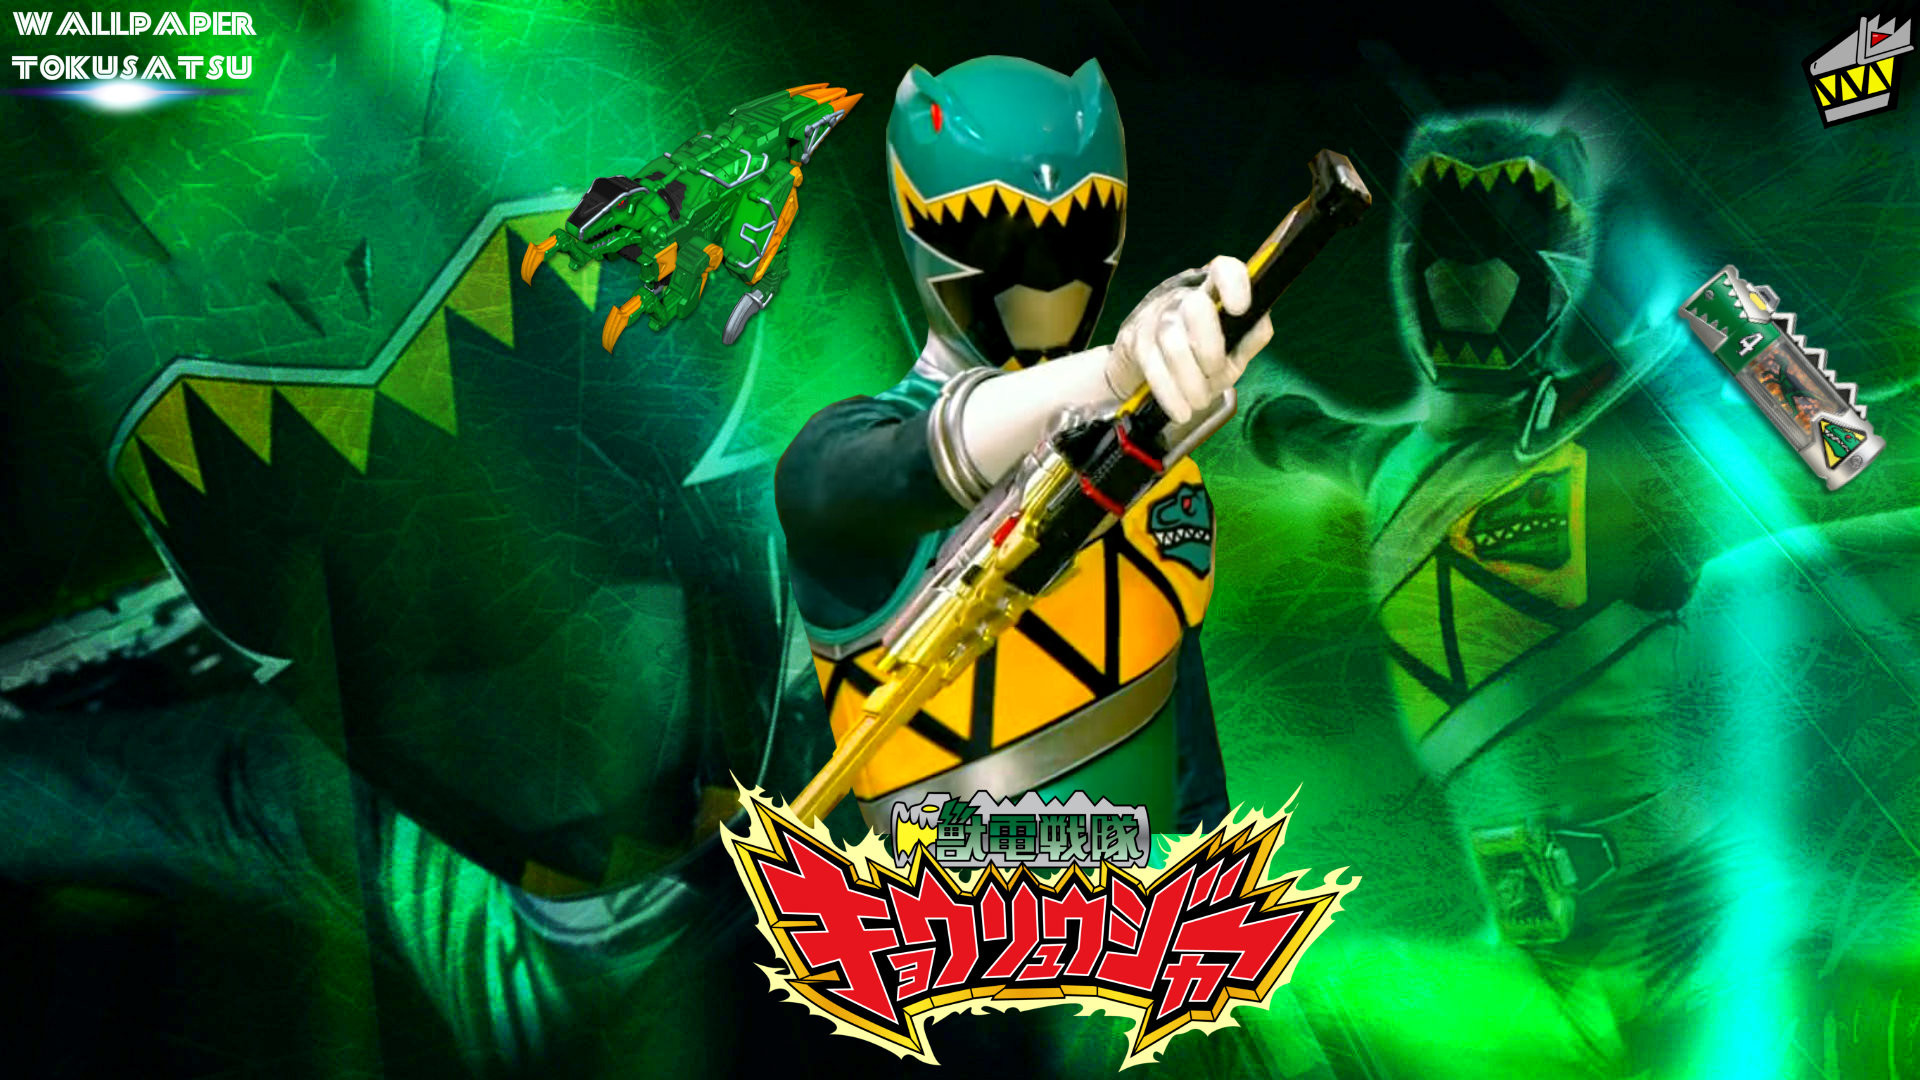 kyoryu green wallpaper by haule0123 kyoryu green wallpaper by haule0123